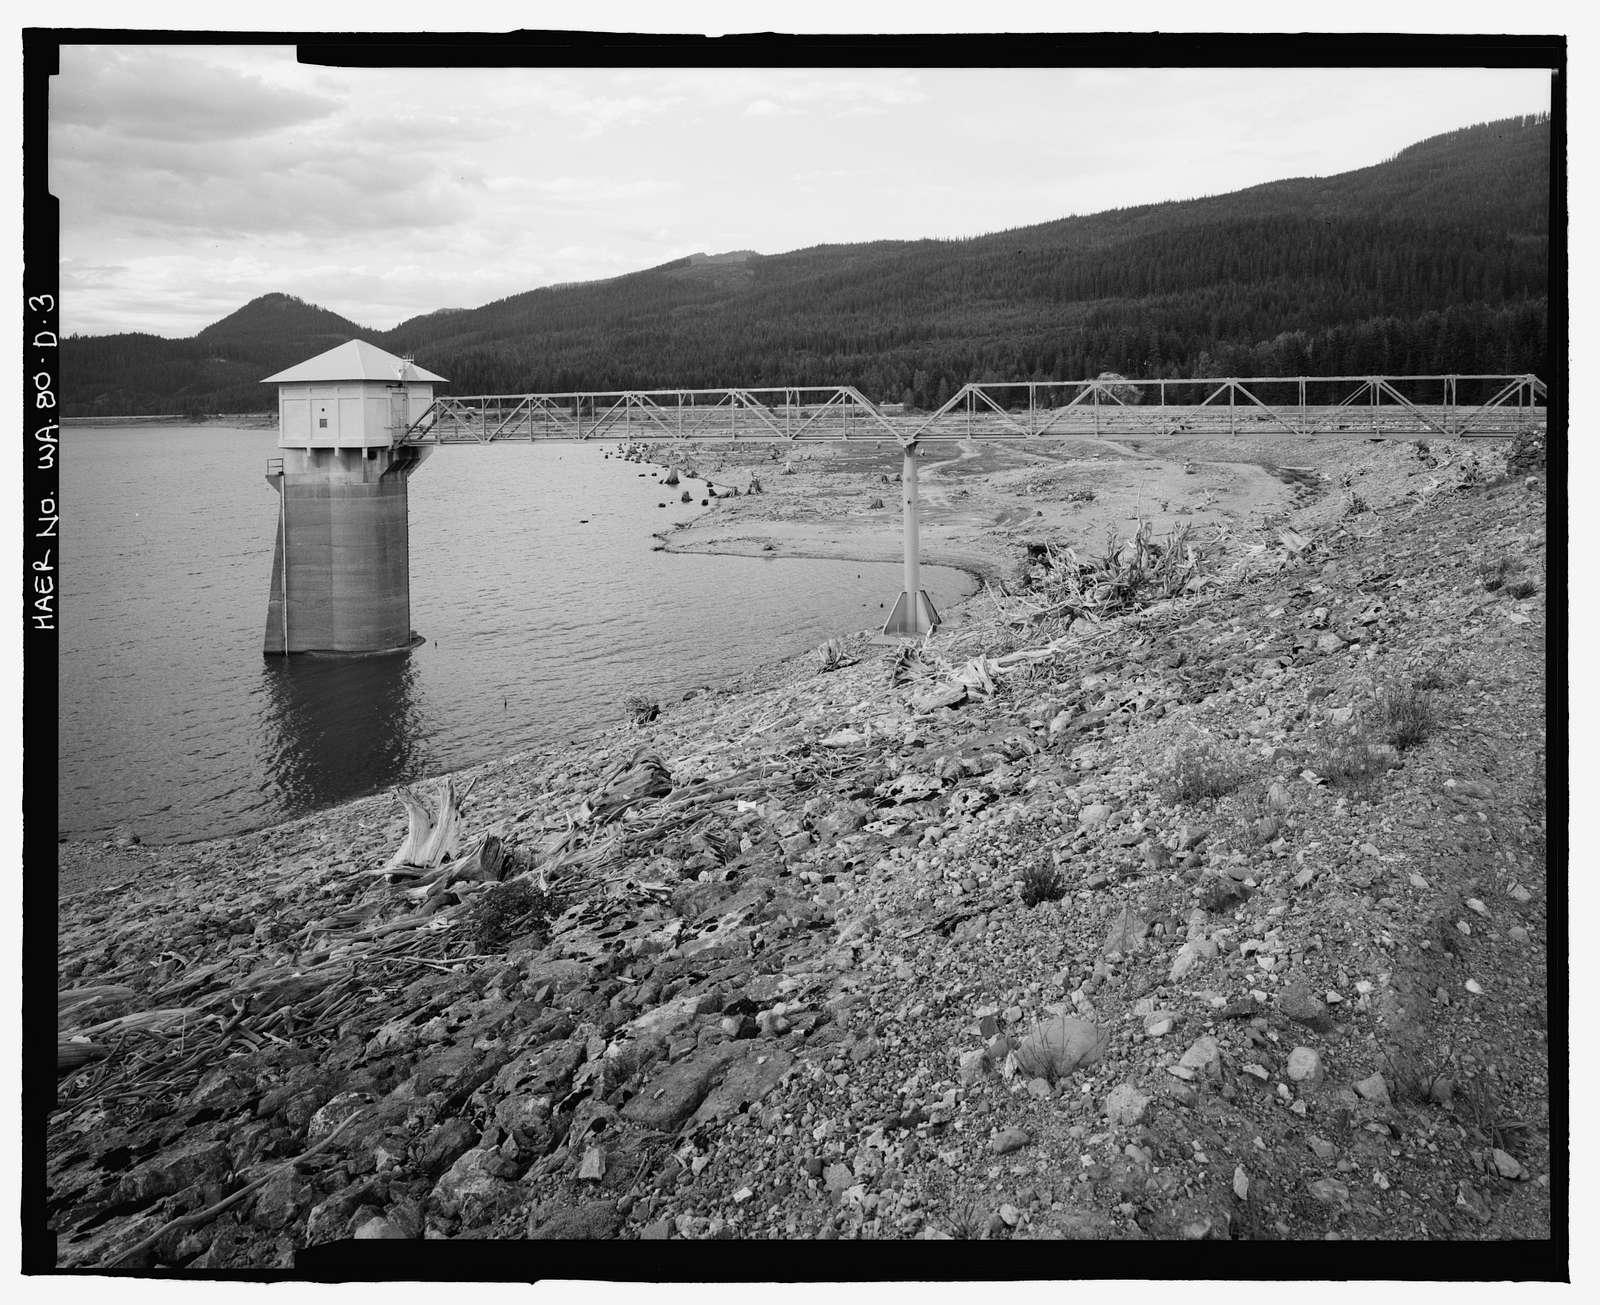 Keechelus Dam, Outlet Tower, Yakim River, 10 miles northwest of Easton, Easton, Kittitas County, WA